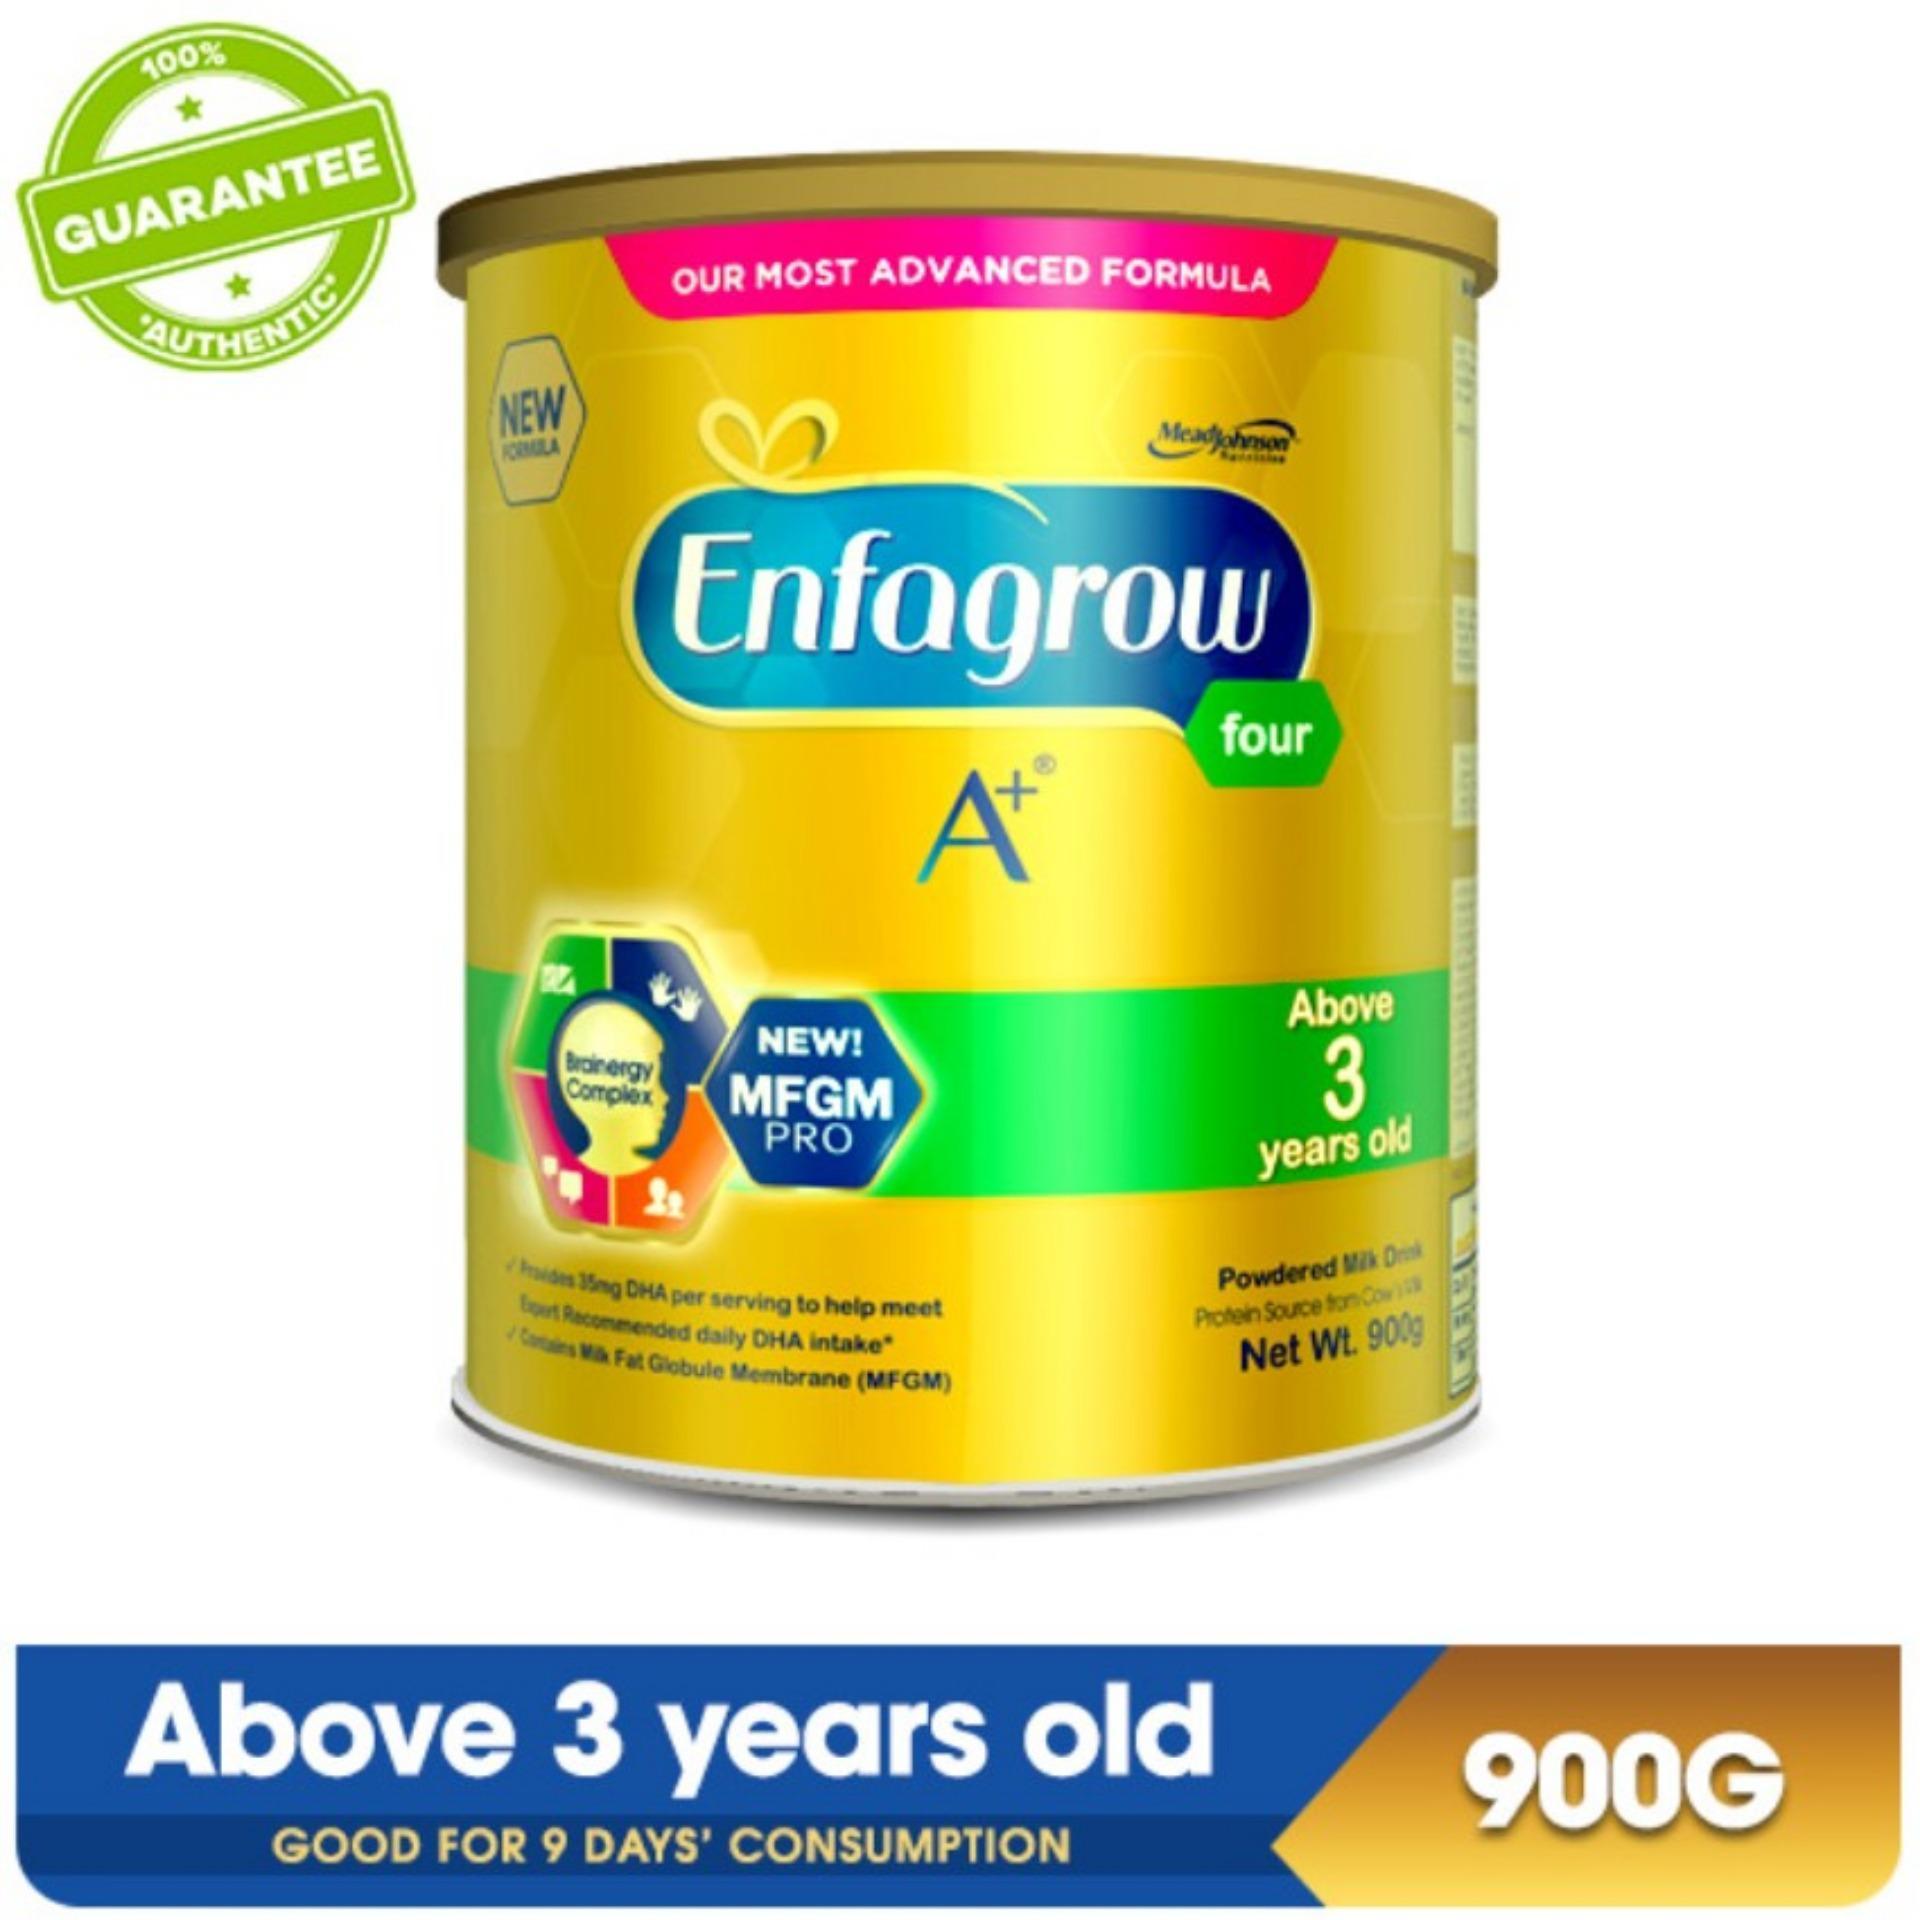 Enfagrow Philippines Price List Powdered Milk Drink For A Plus 3 1800 Gram Vanilla Box Four Years Old 900g